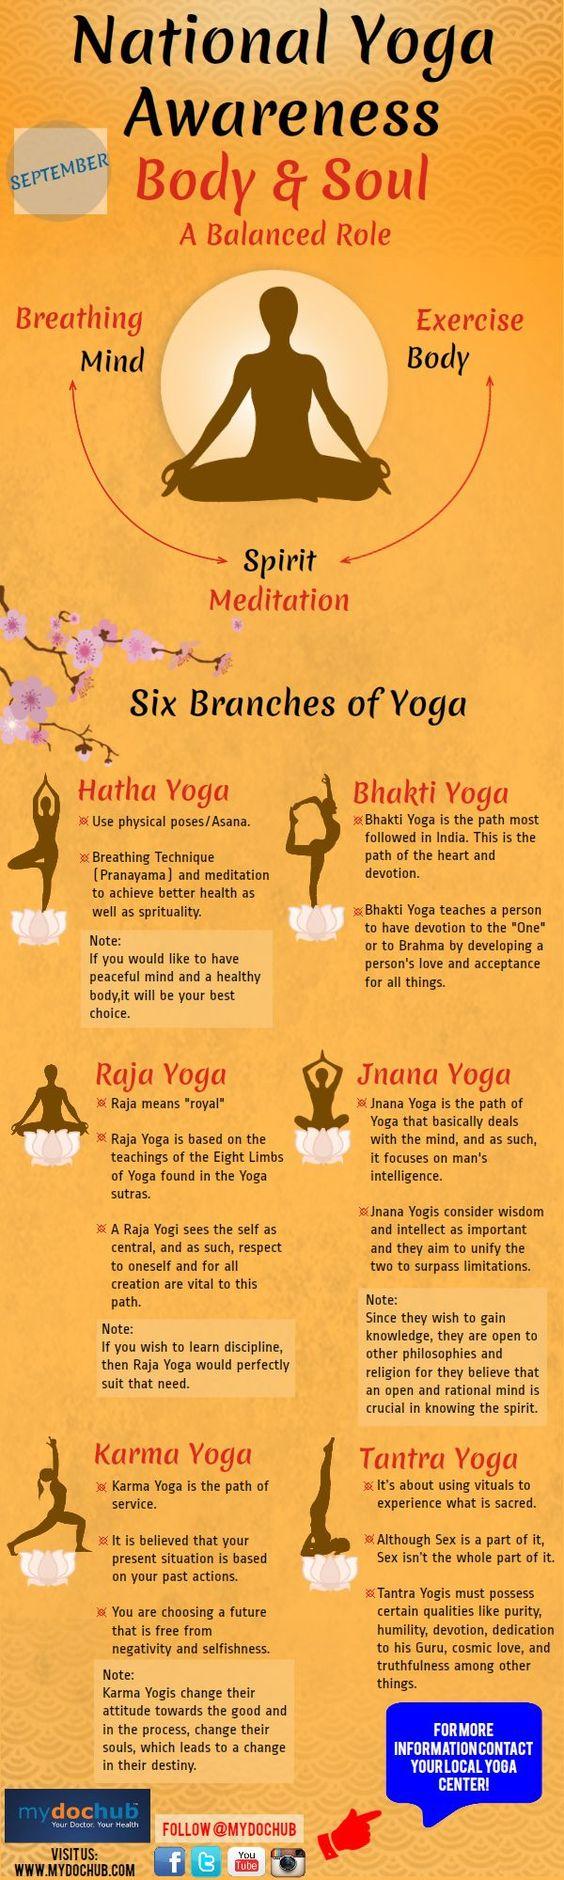 National Yoga Awareness: Body & Soul